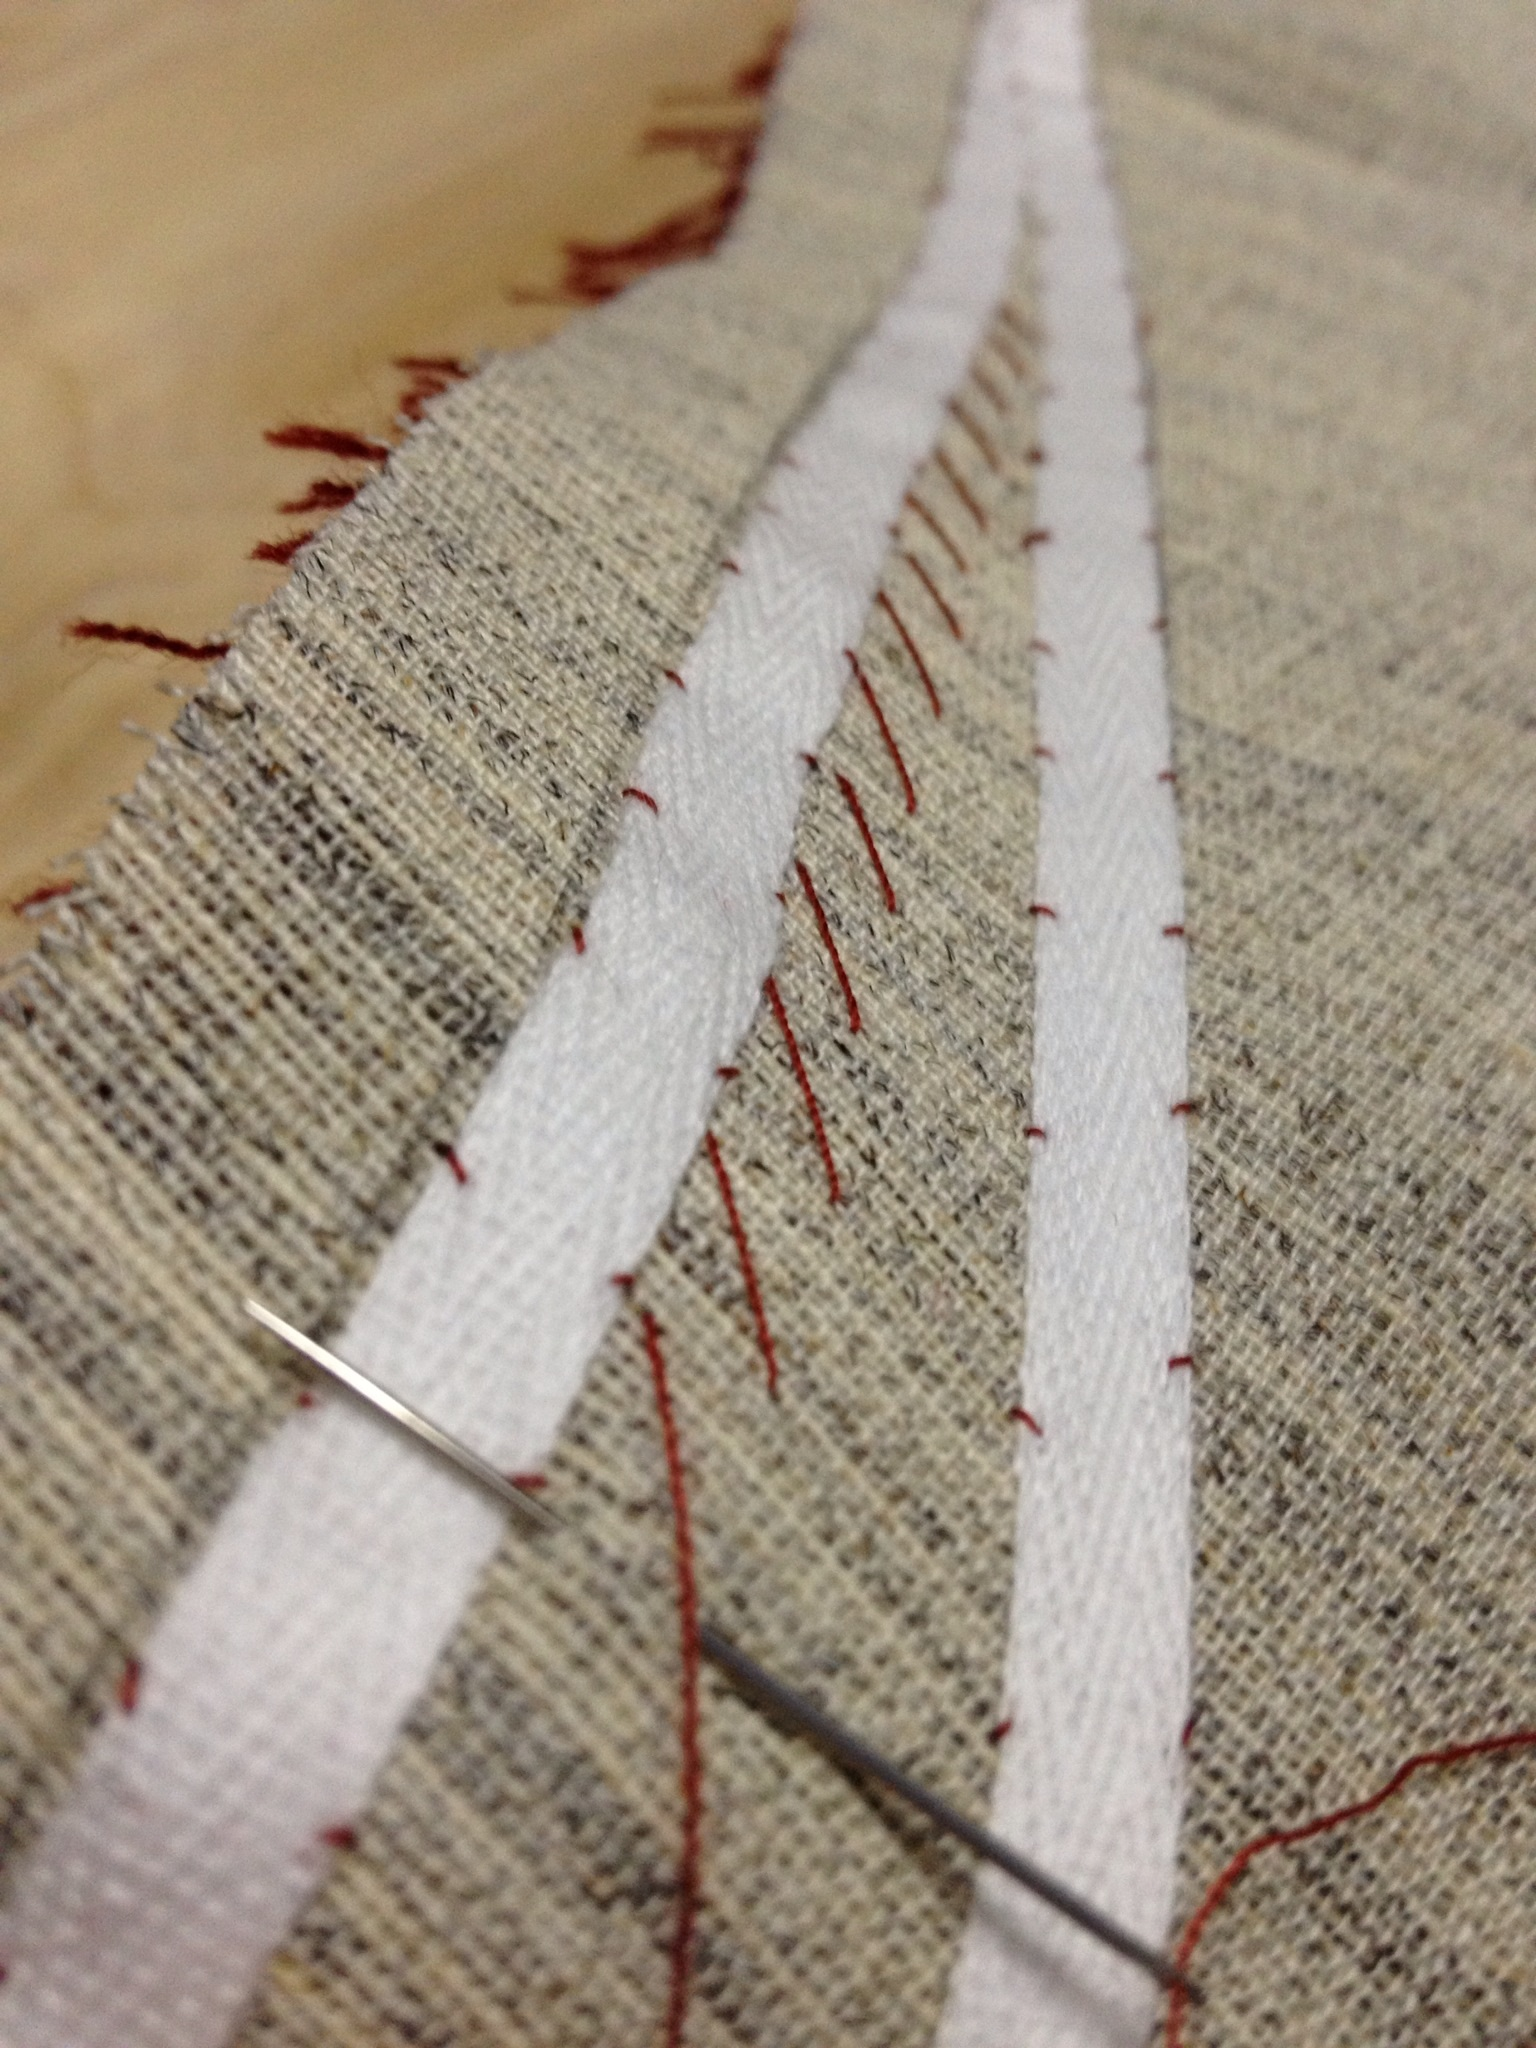 Pad stitching progressing.